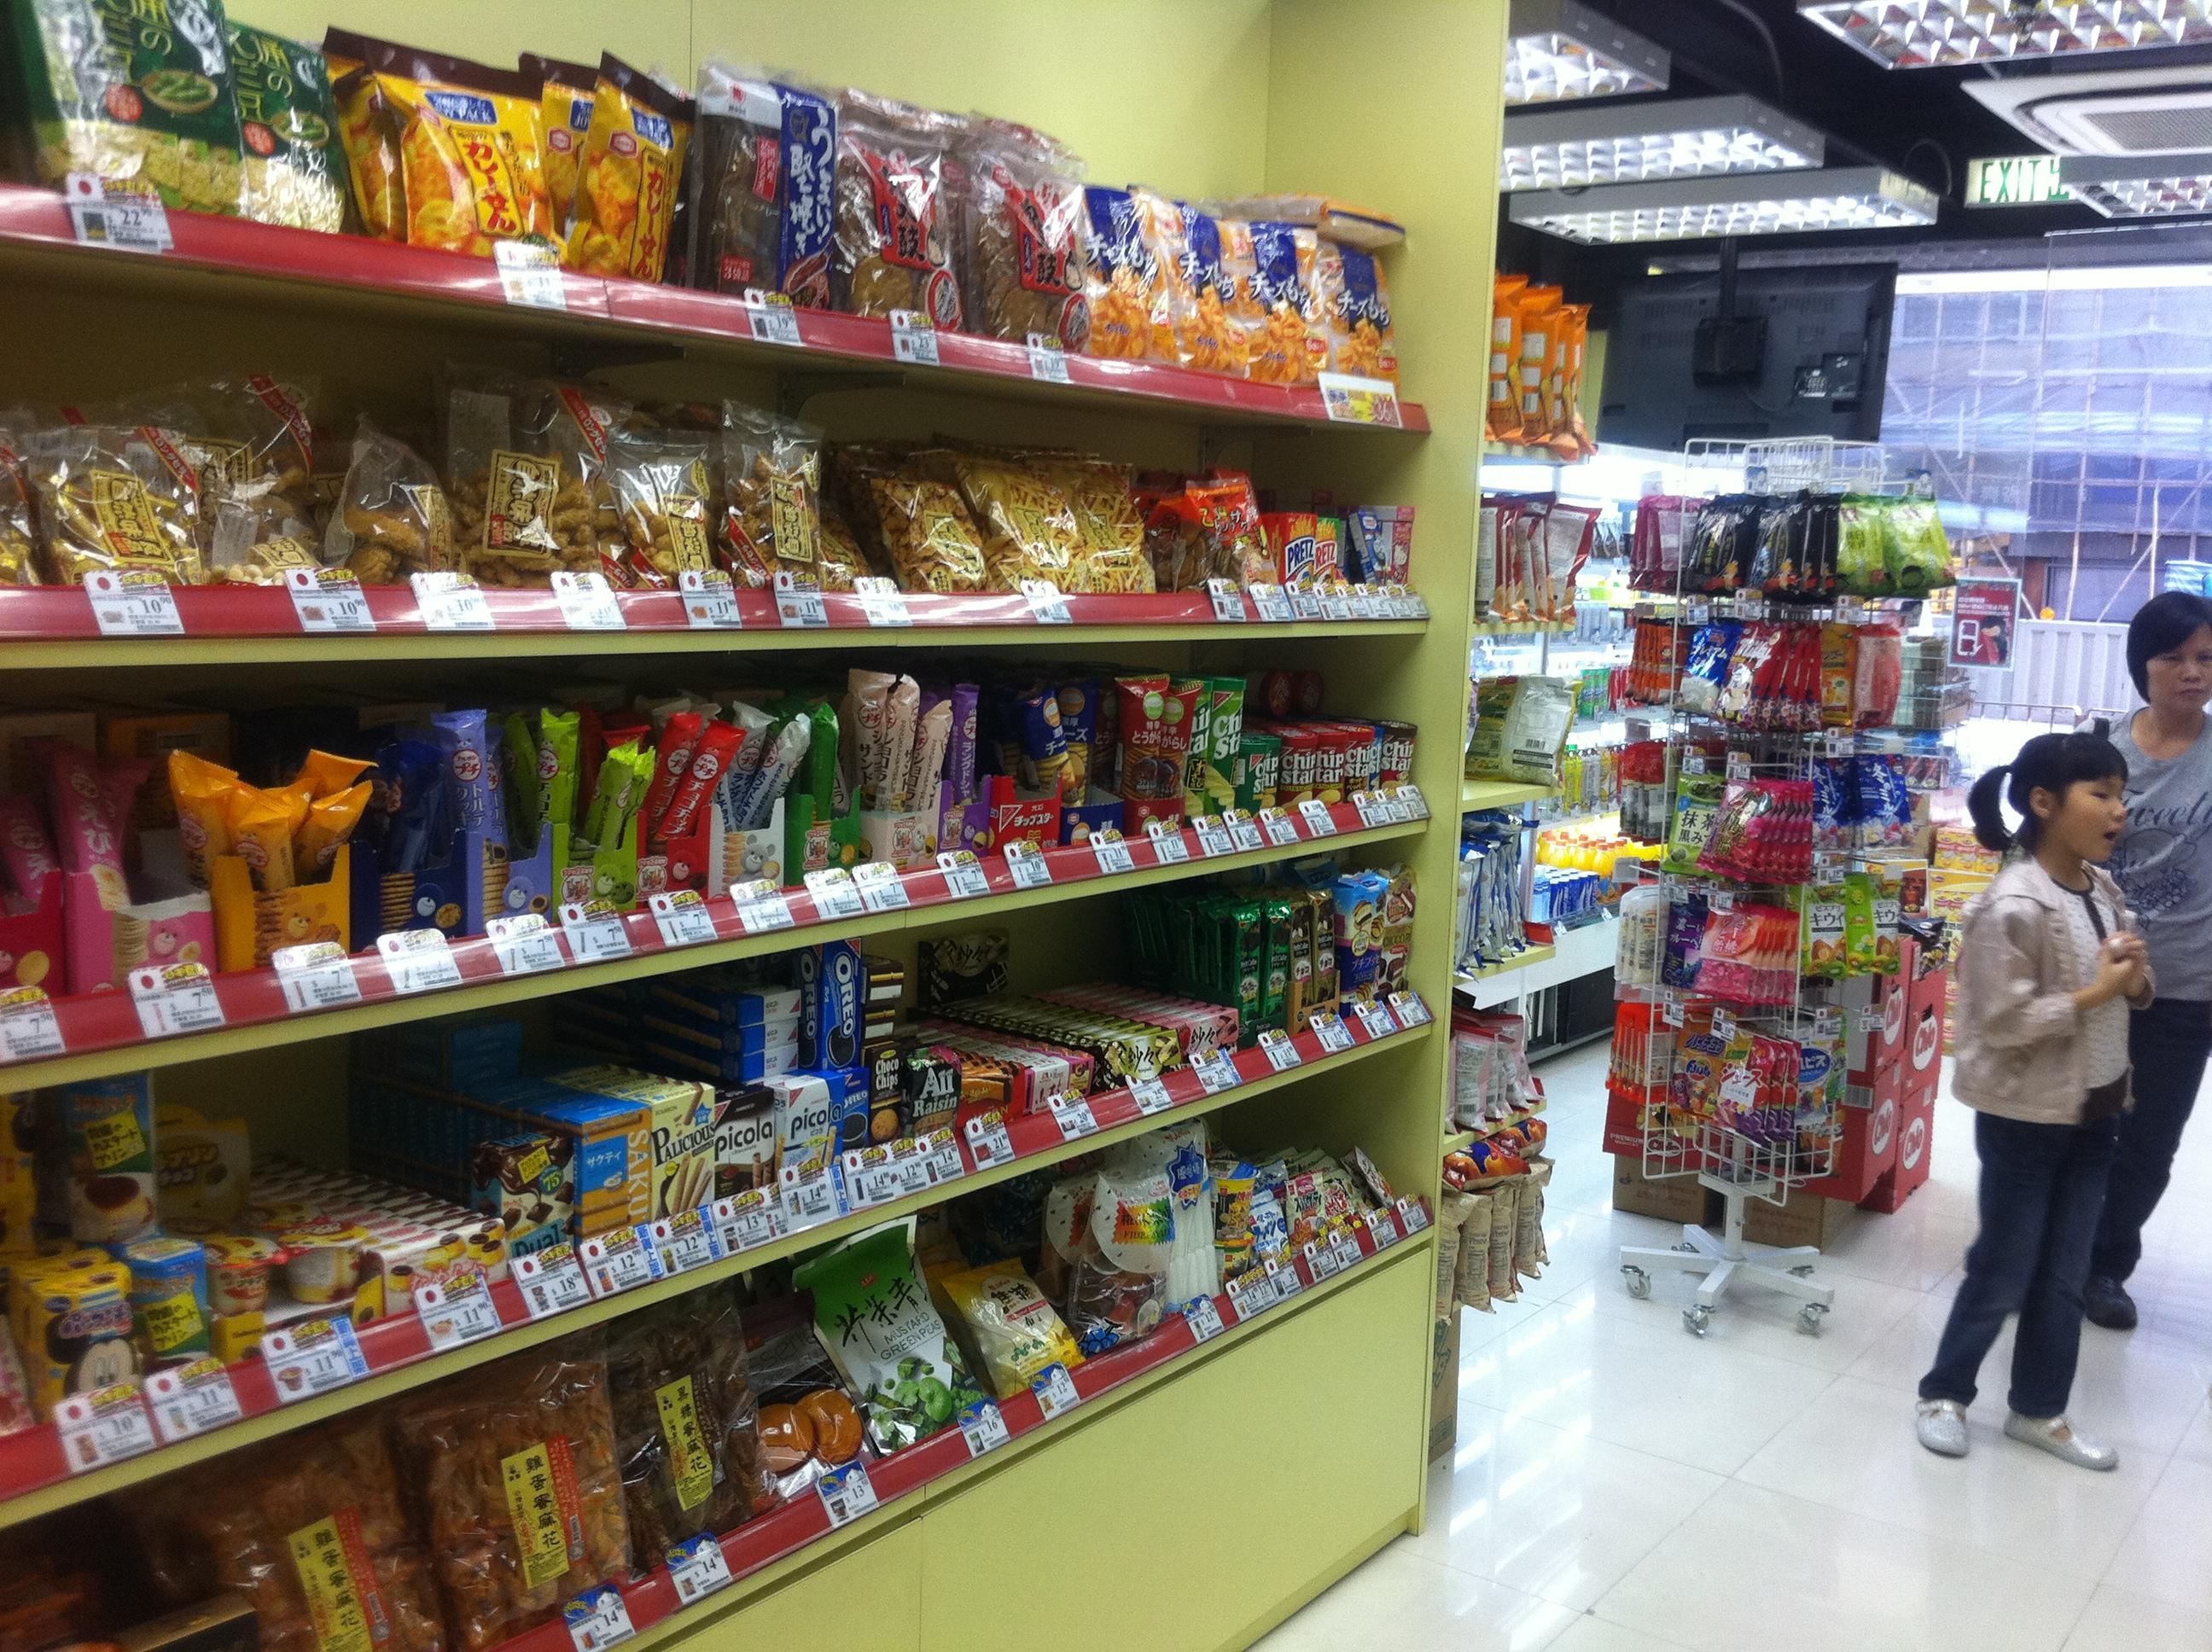 File:HK 北角 North Point 759阿信屋 759零食屋 759 Store interior